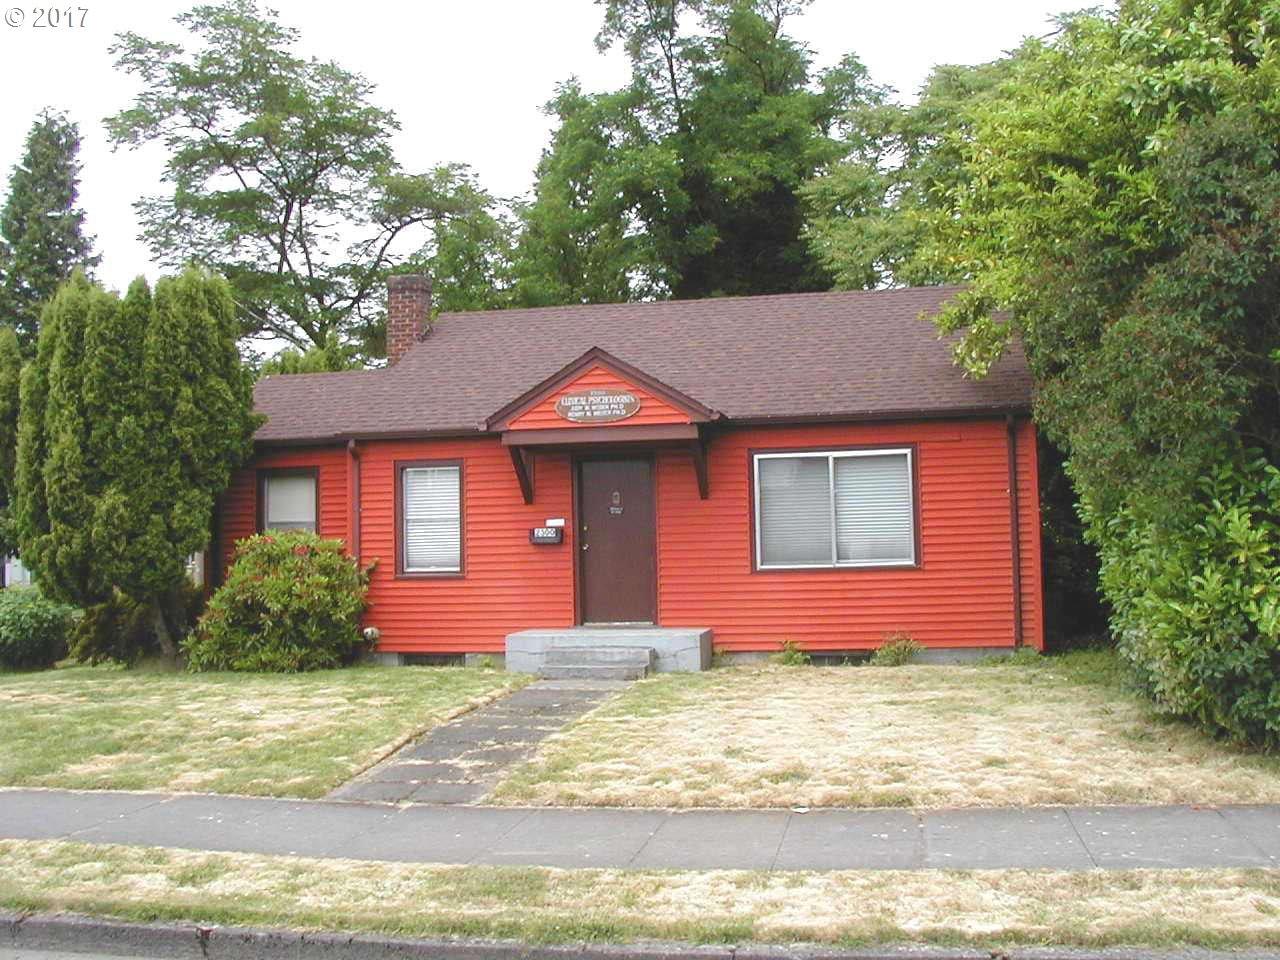 2300 E MILL PLAIN BLVD, Vancouver, WA 98661